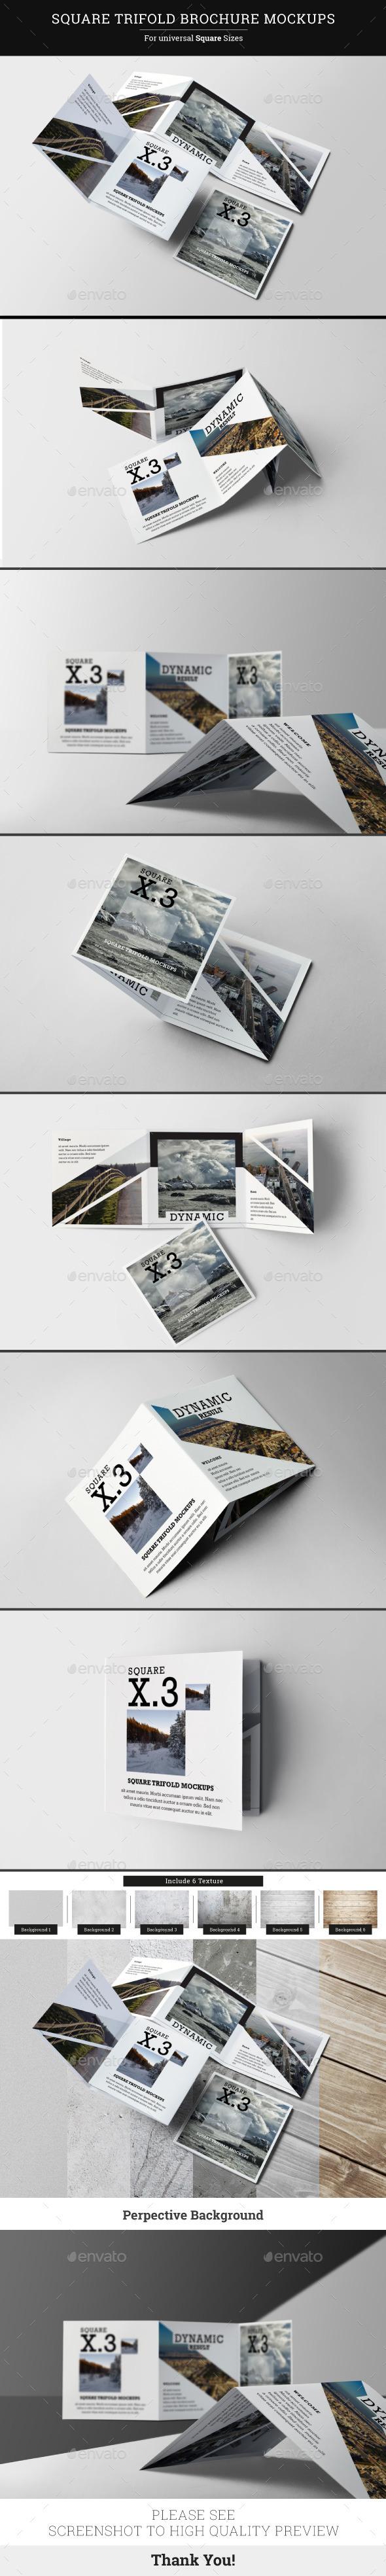 Square Trifold Brochure Mockups - Brochures Print